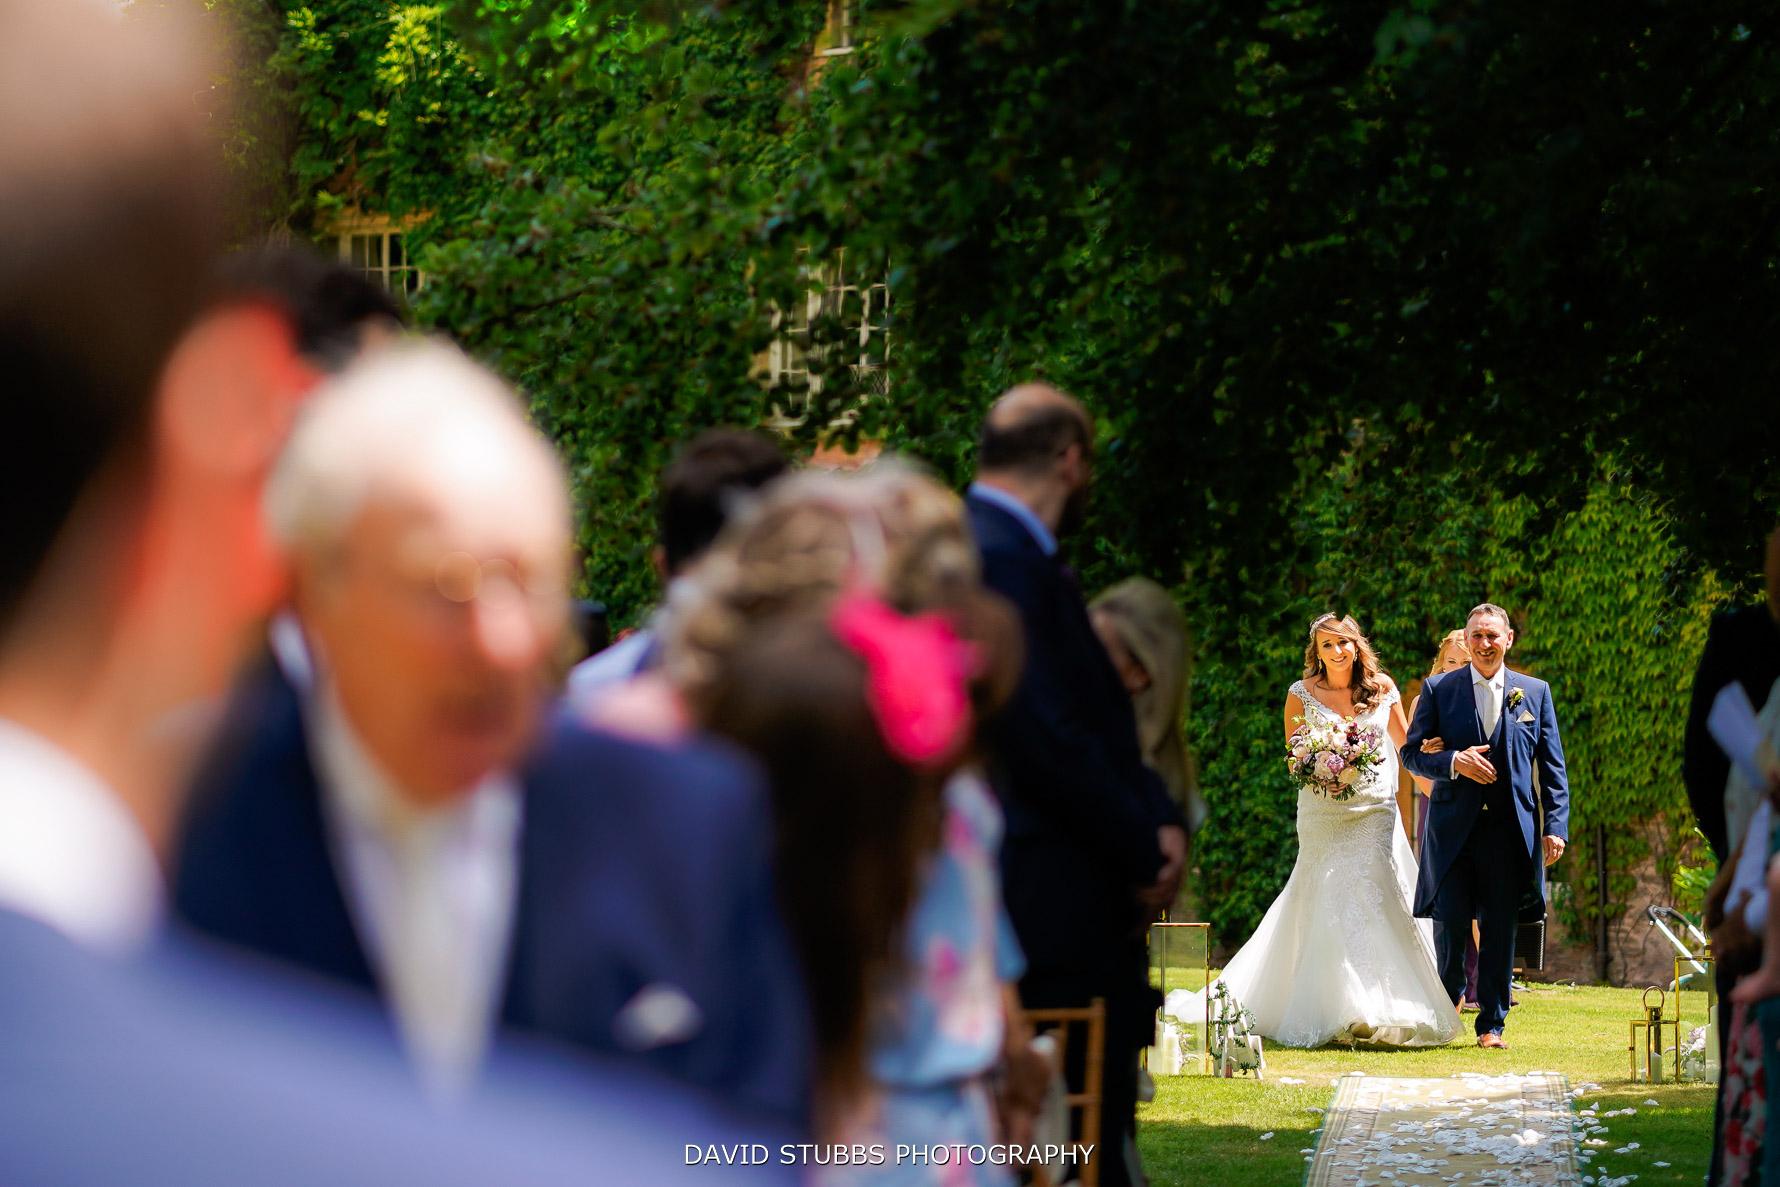 wedding isle walk